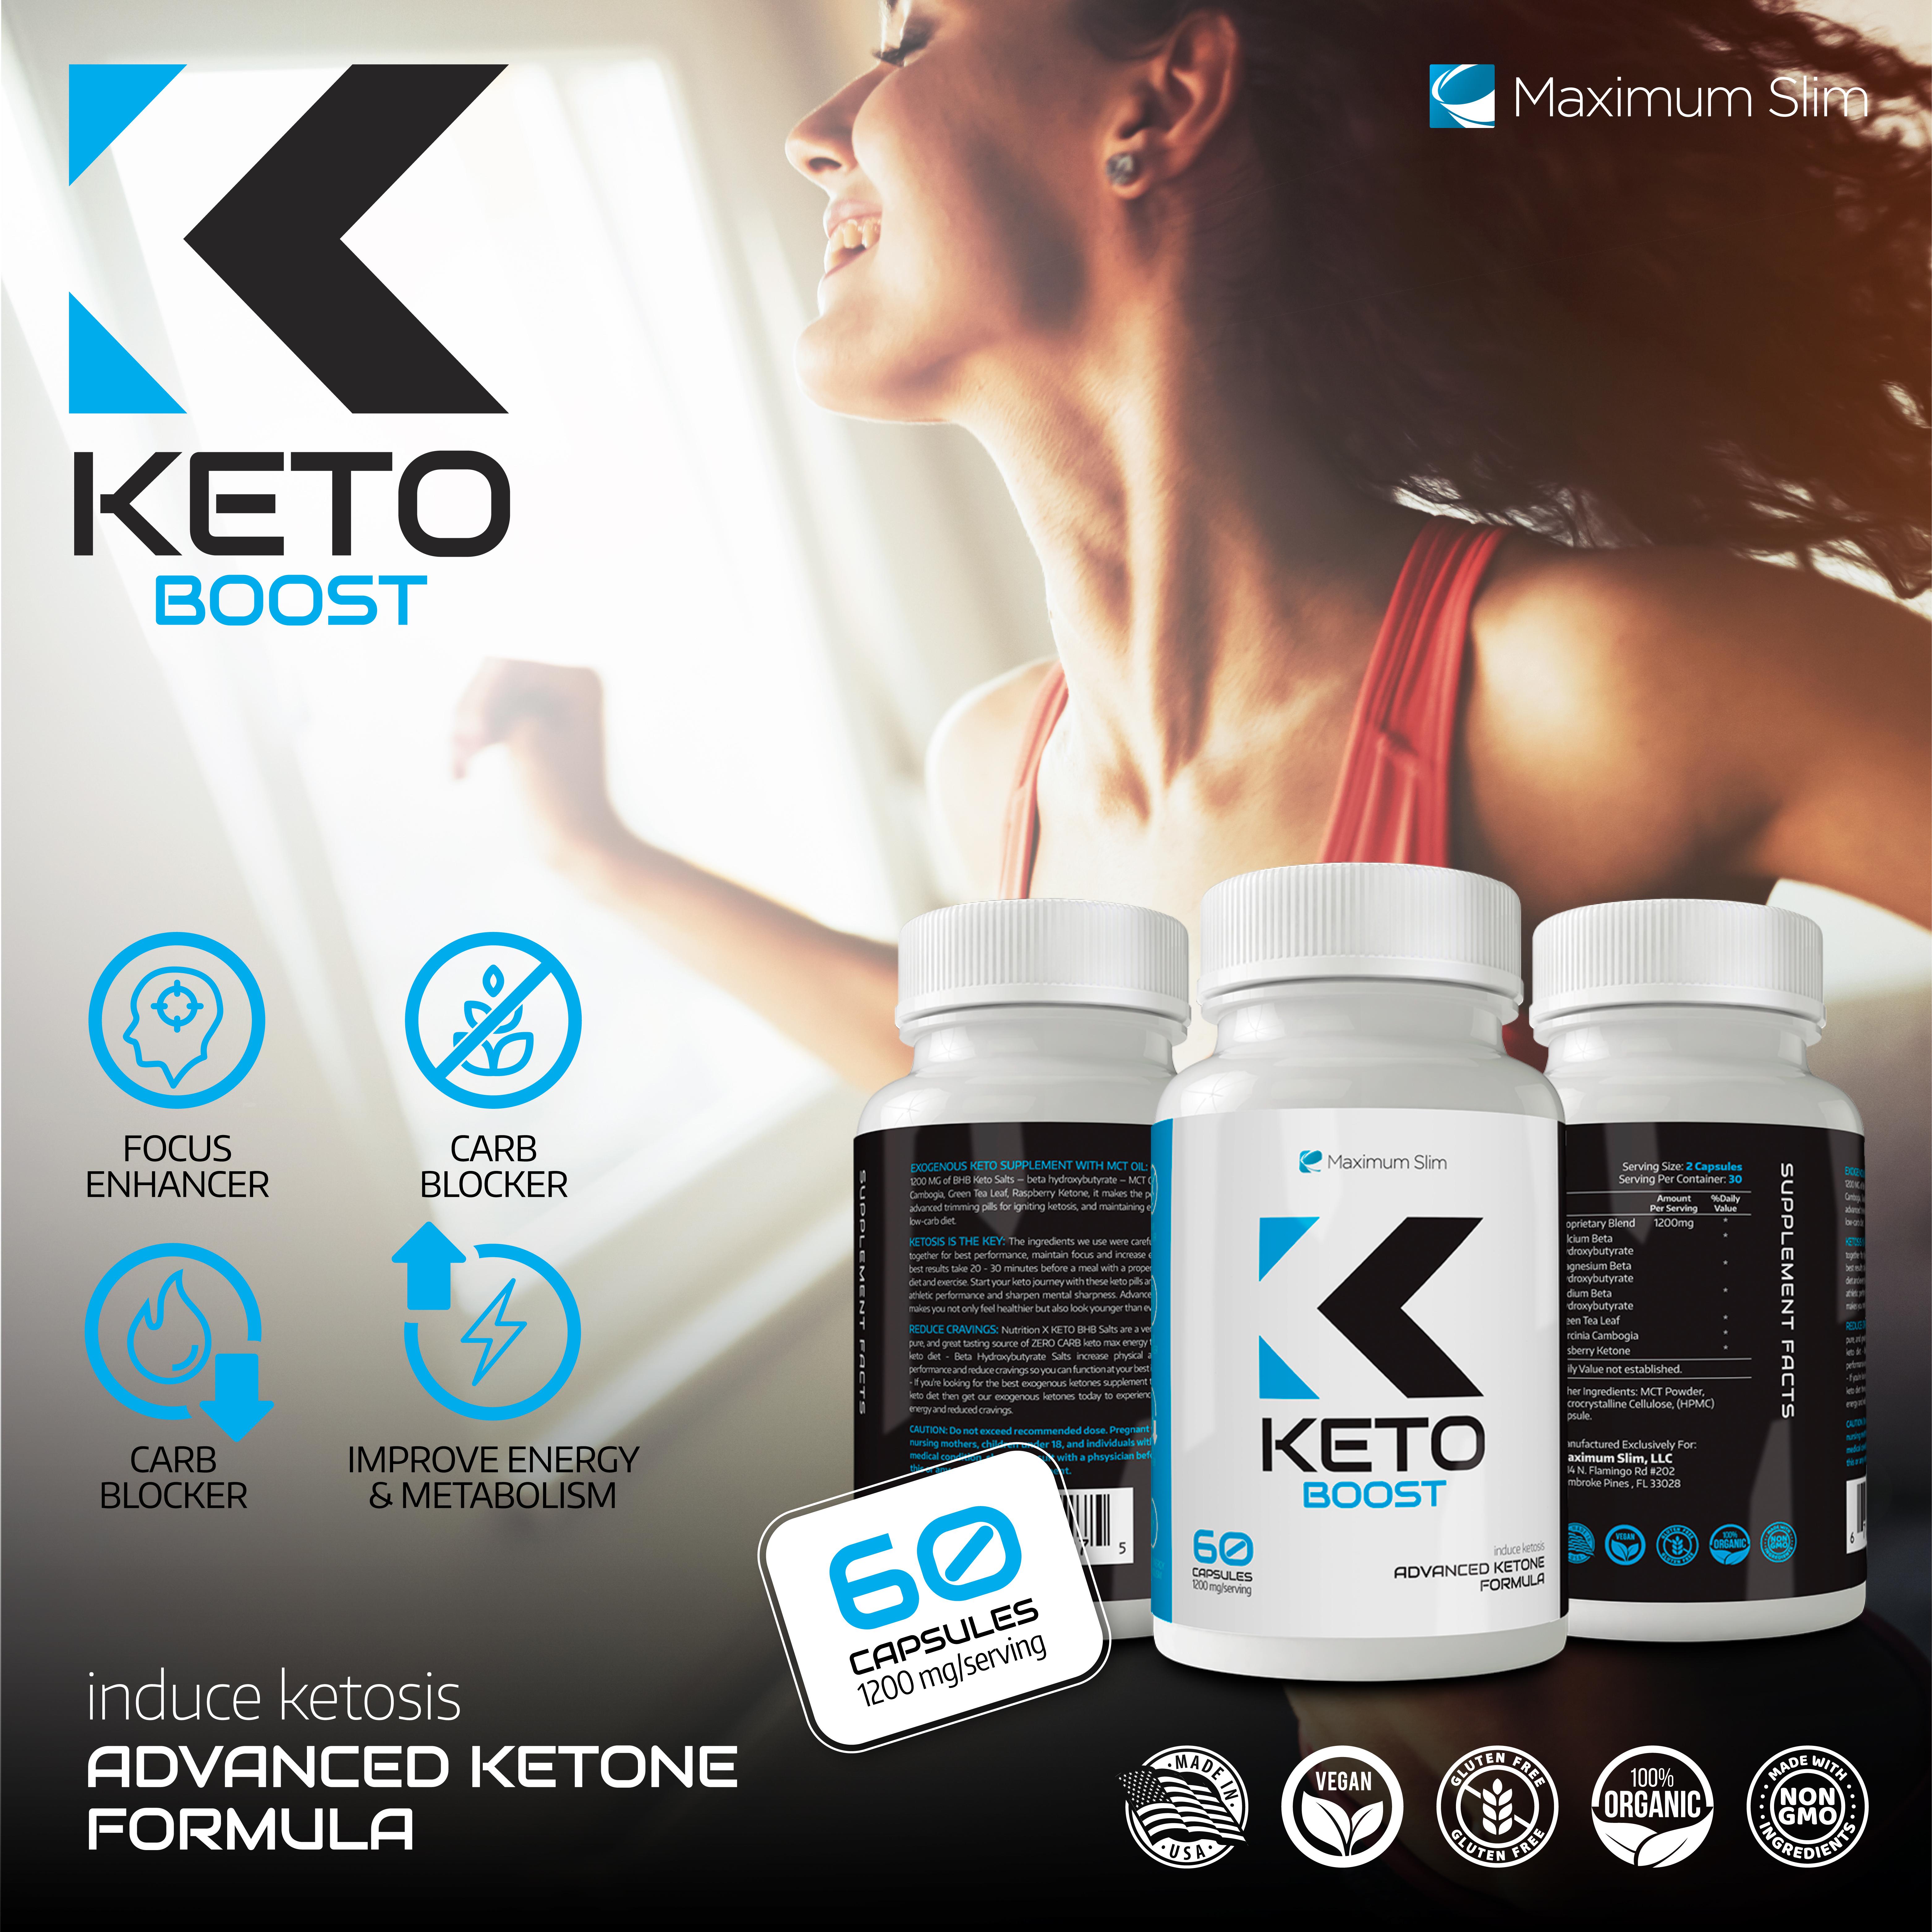 keto-boost-presentation-rev01b.jpg